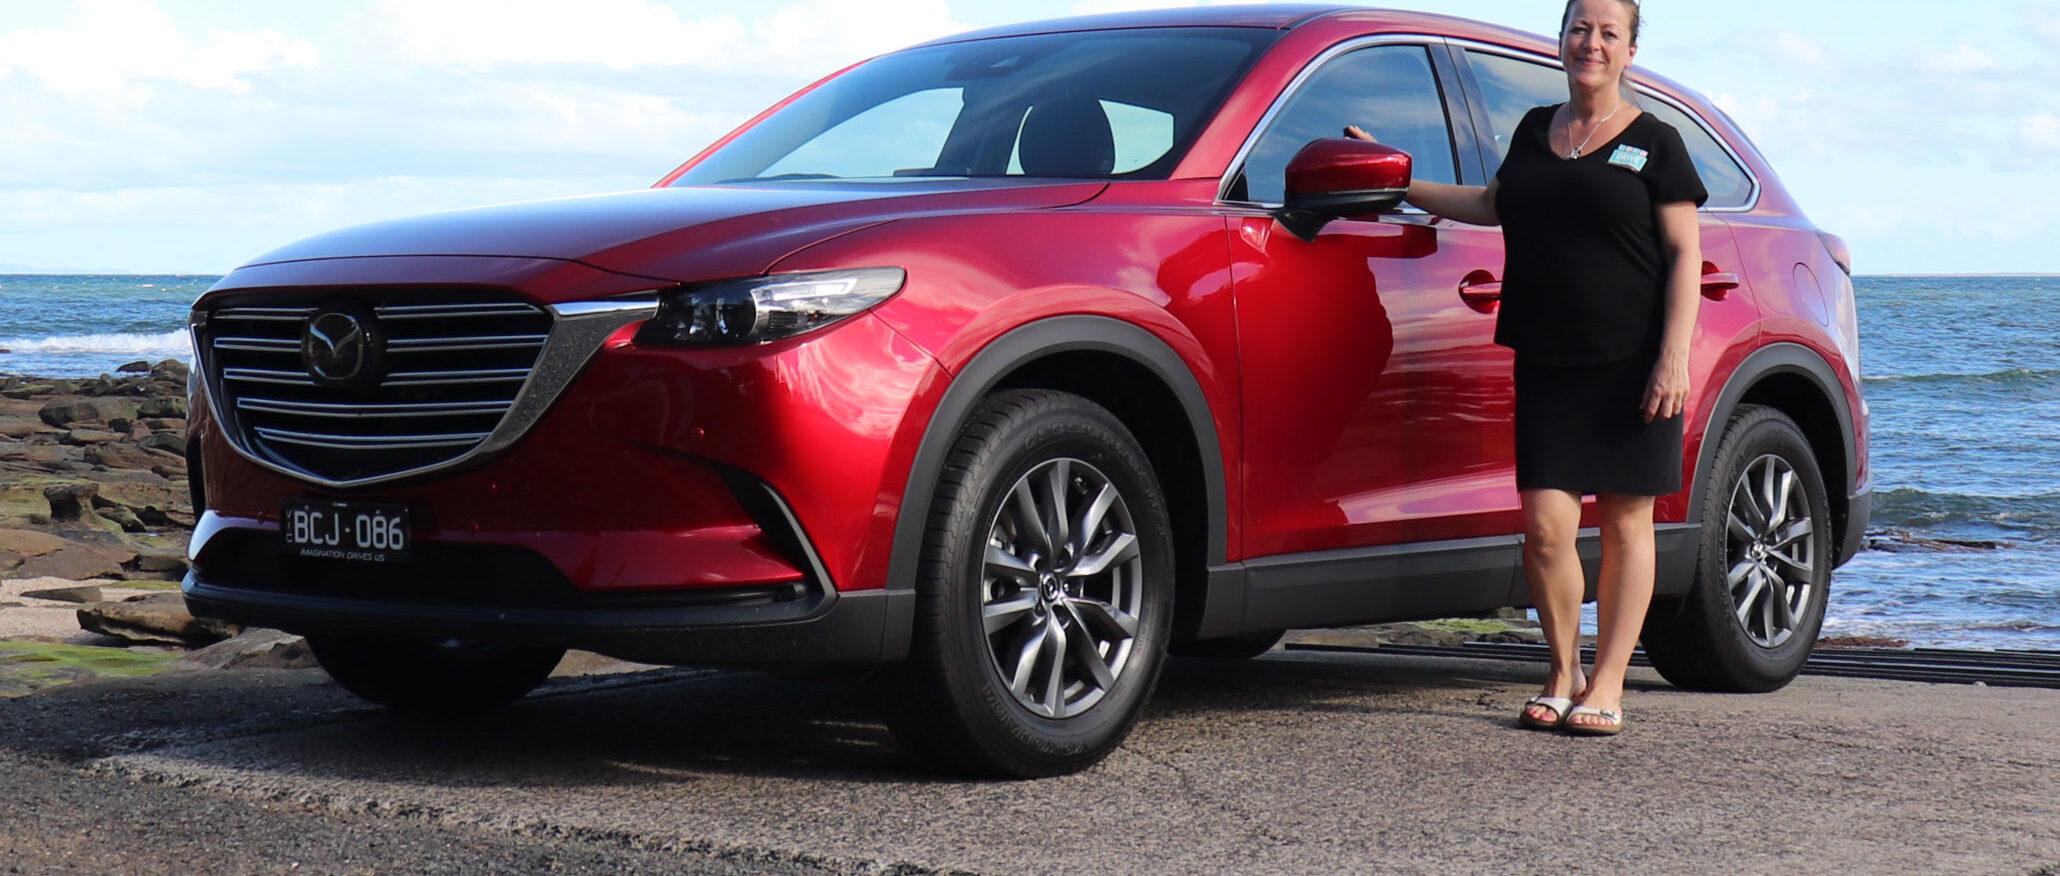 22020 Mazda CX-9 top 10 family friendly features020-Mazda-CX-9-top-10-family-friendly-features